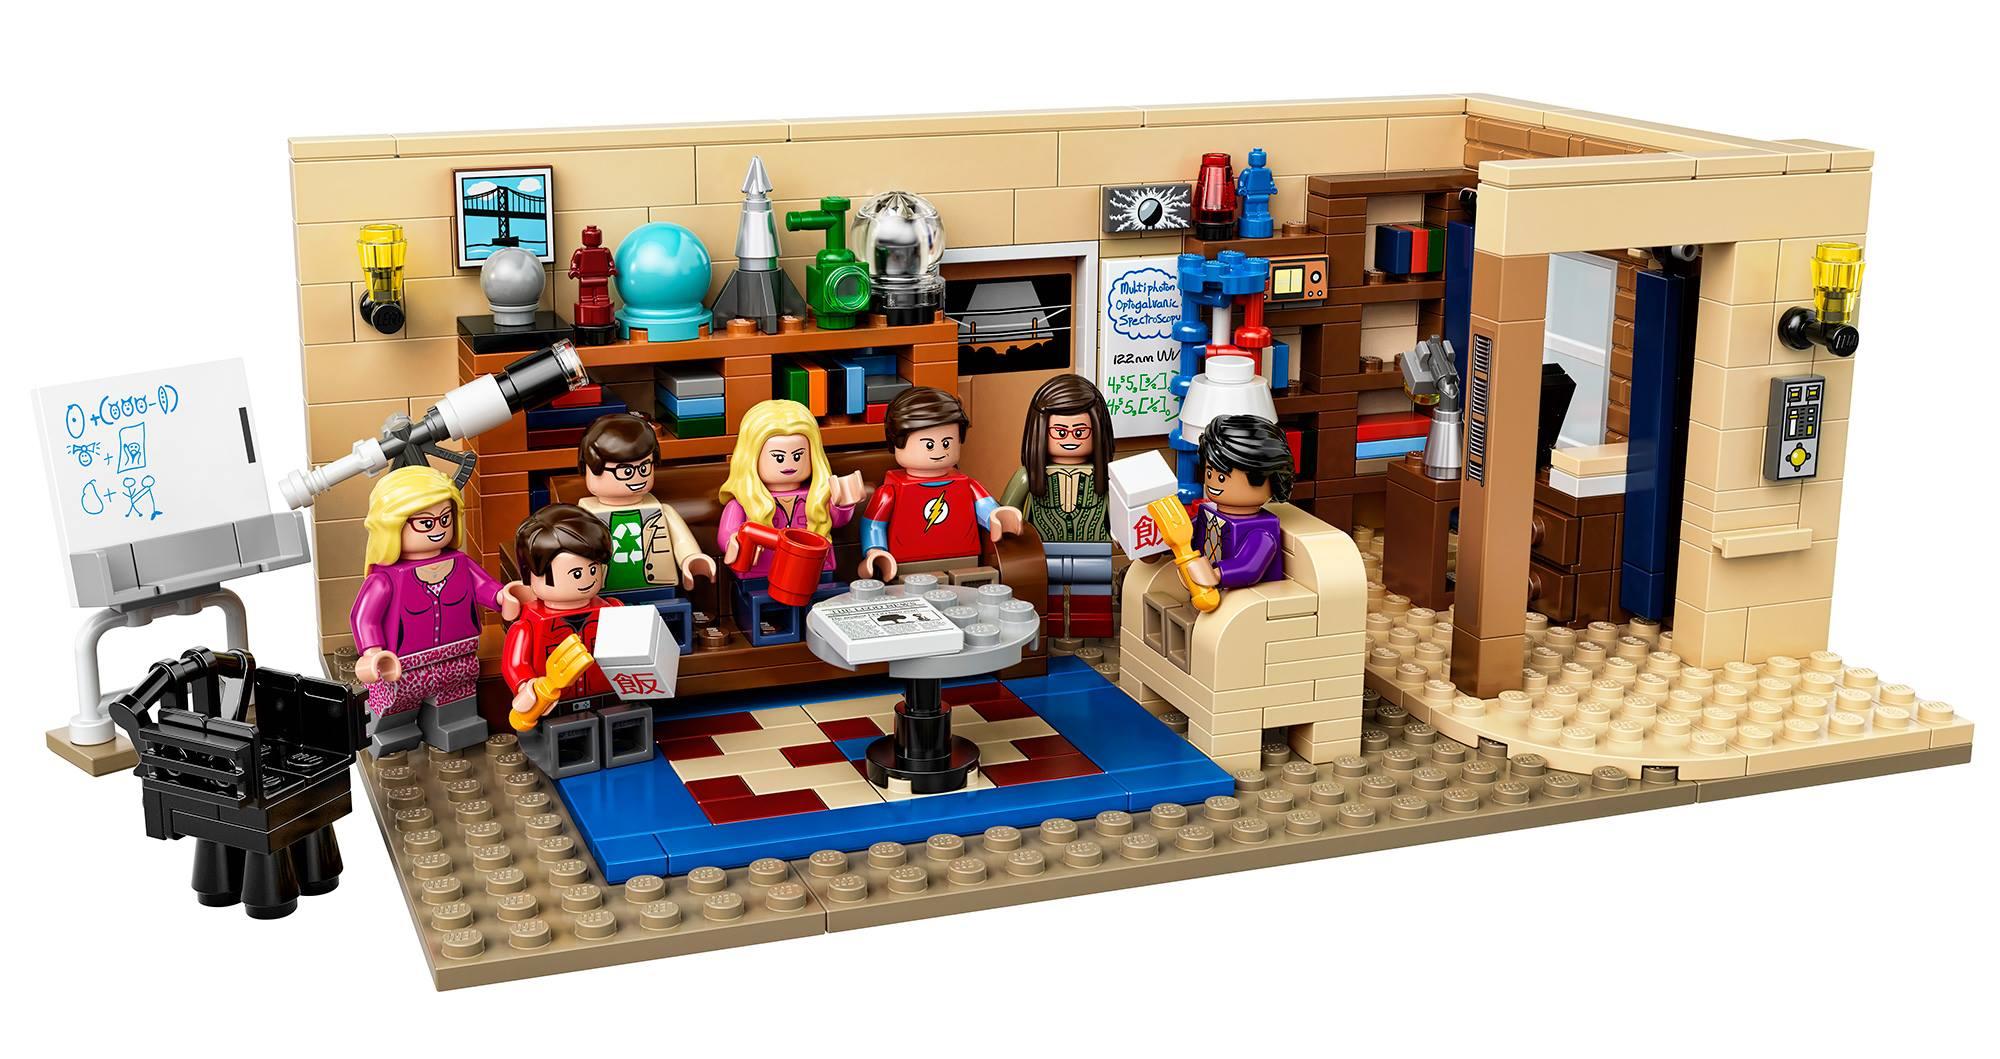 LEGO to Make 'Big Bang Theory' Set